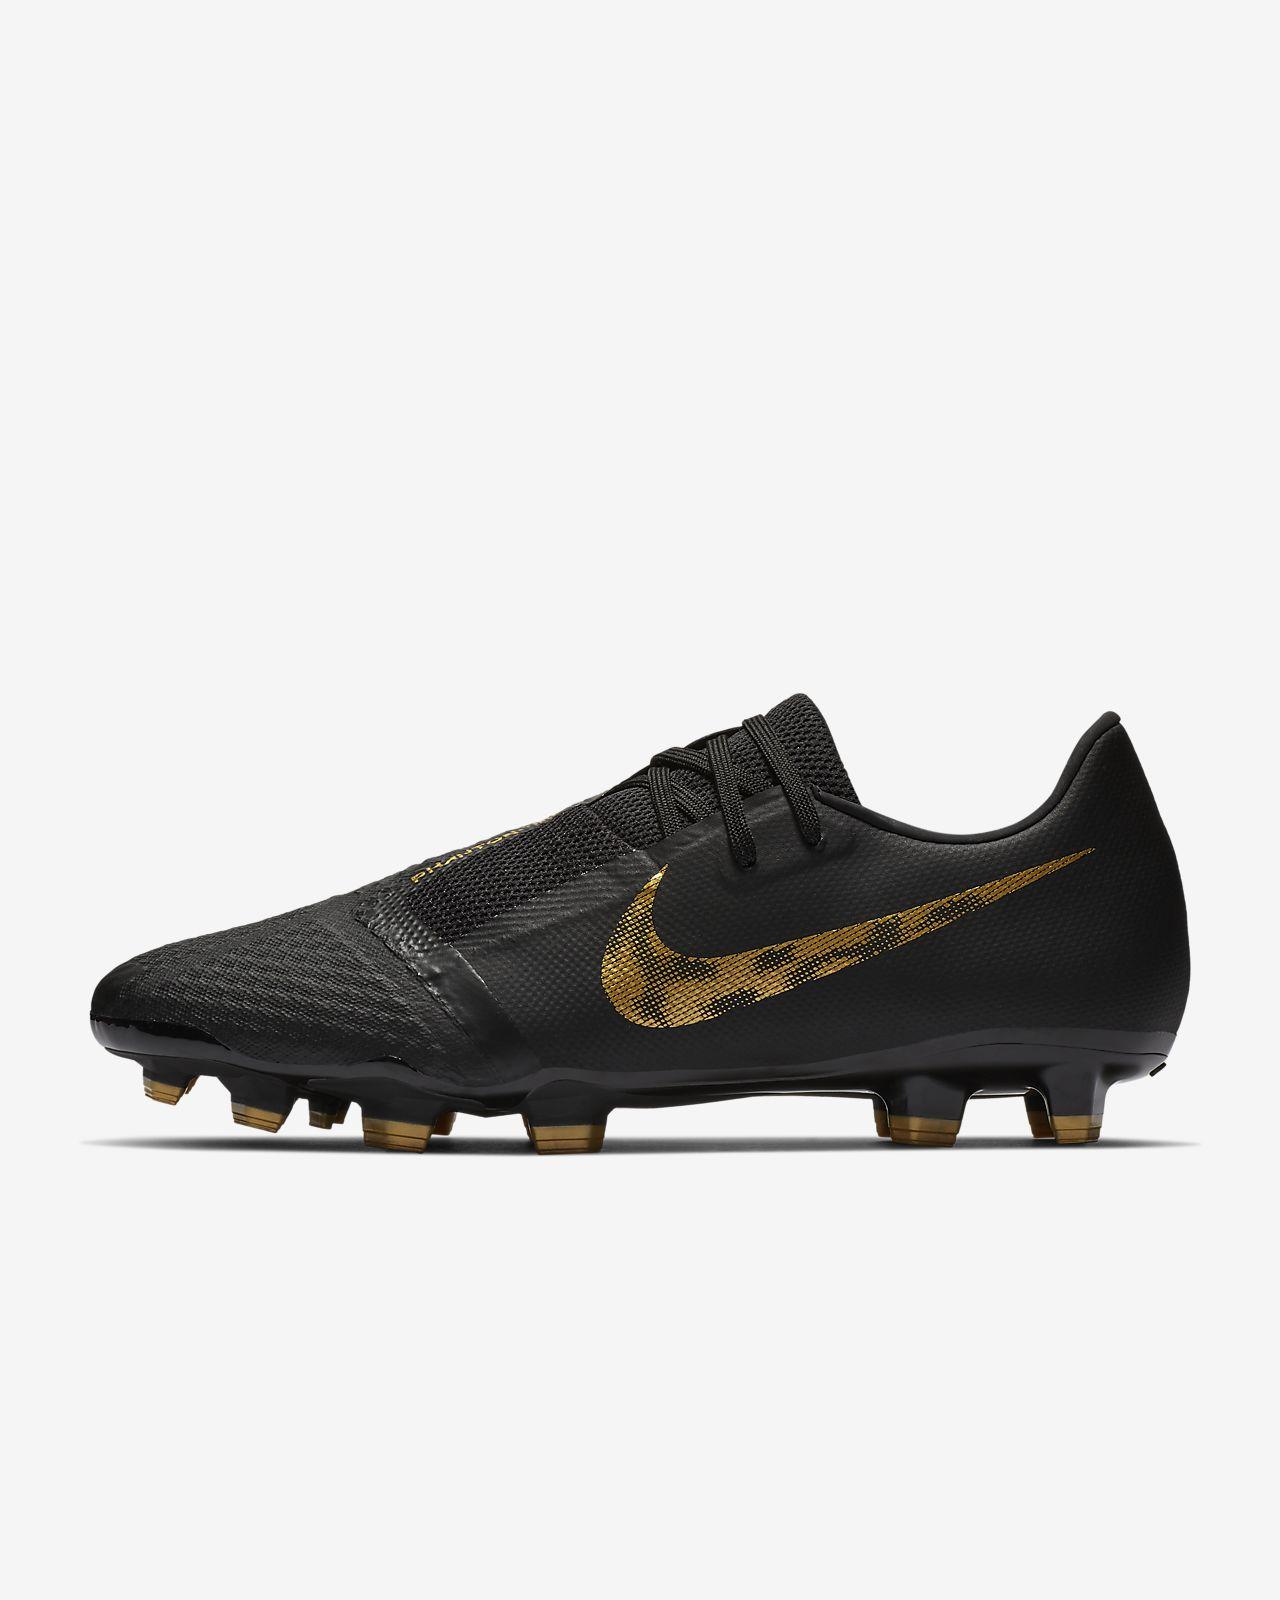 Nike PhantomVNM Academy FG Game Over Firm-Ground Football Boot